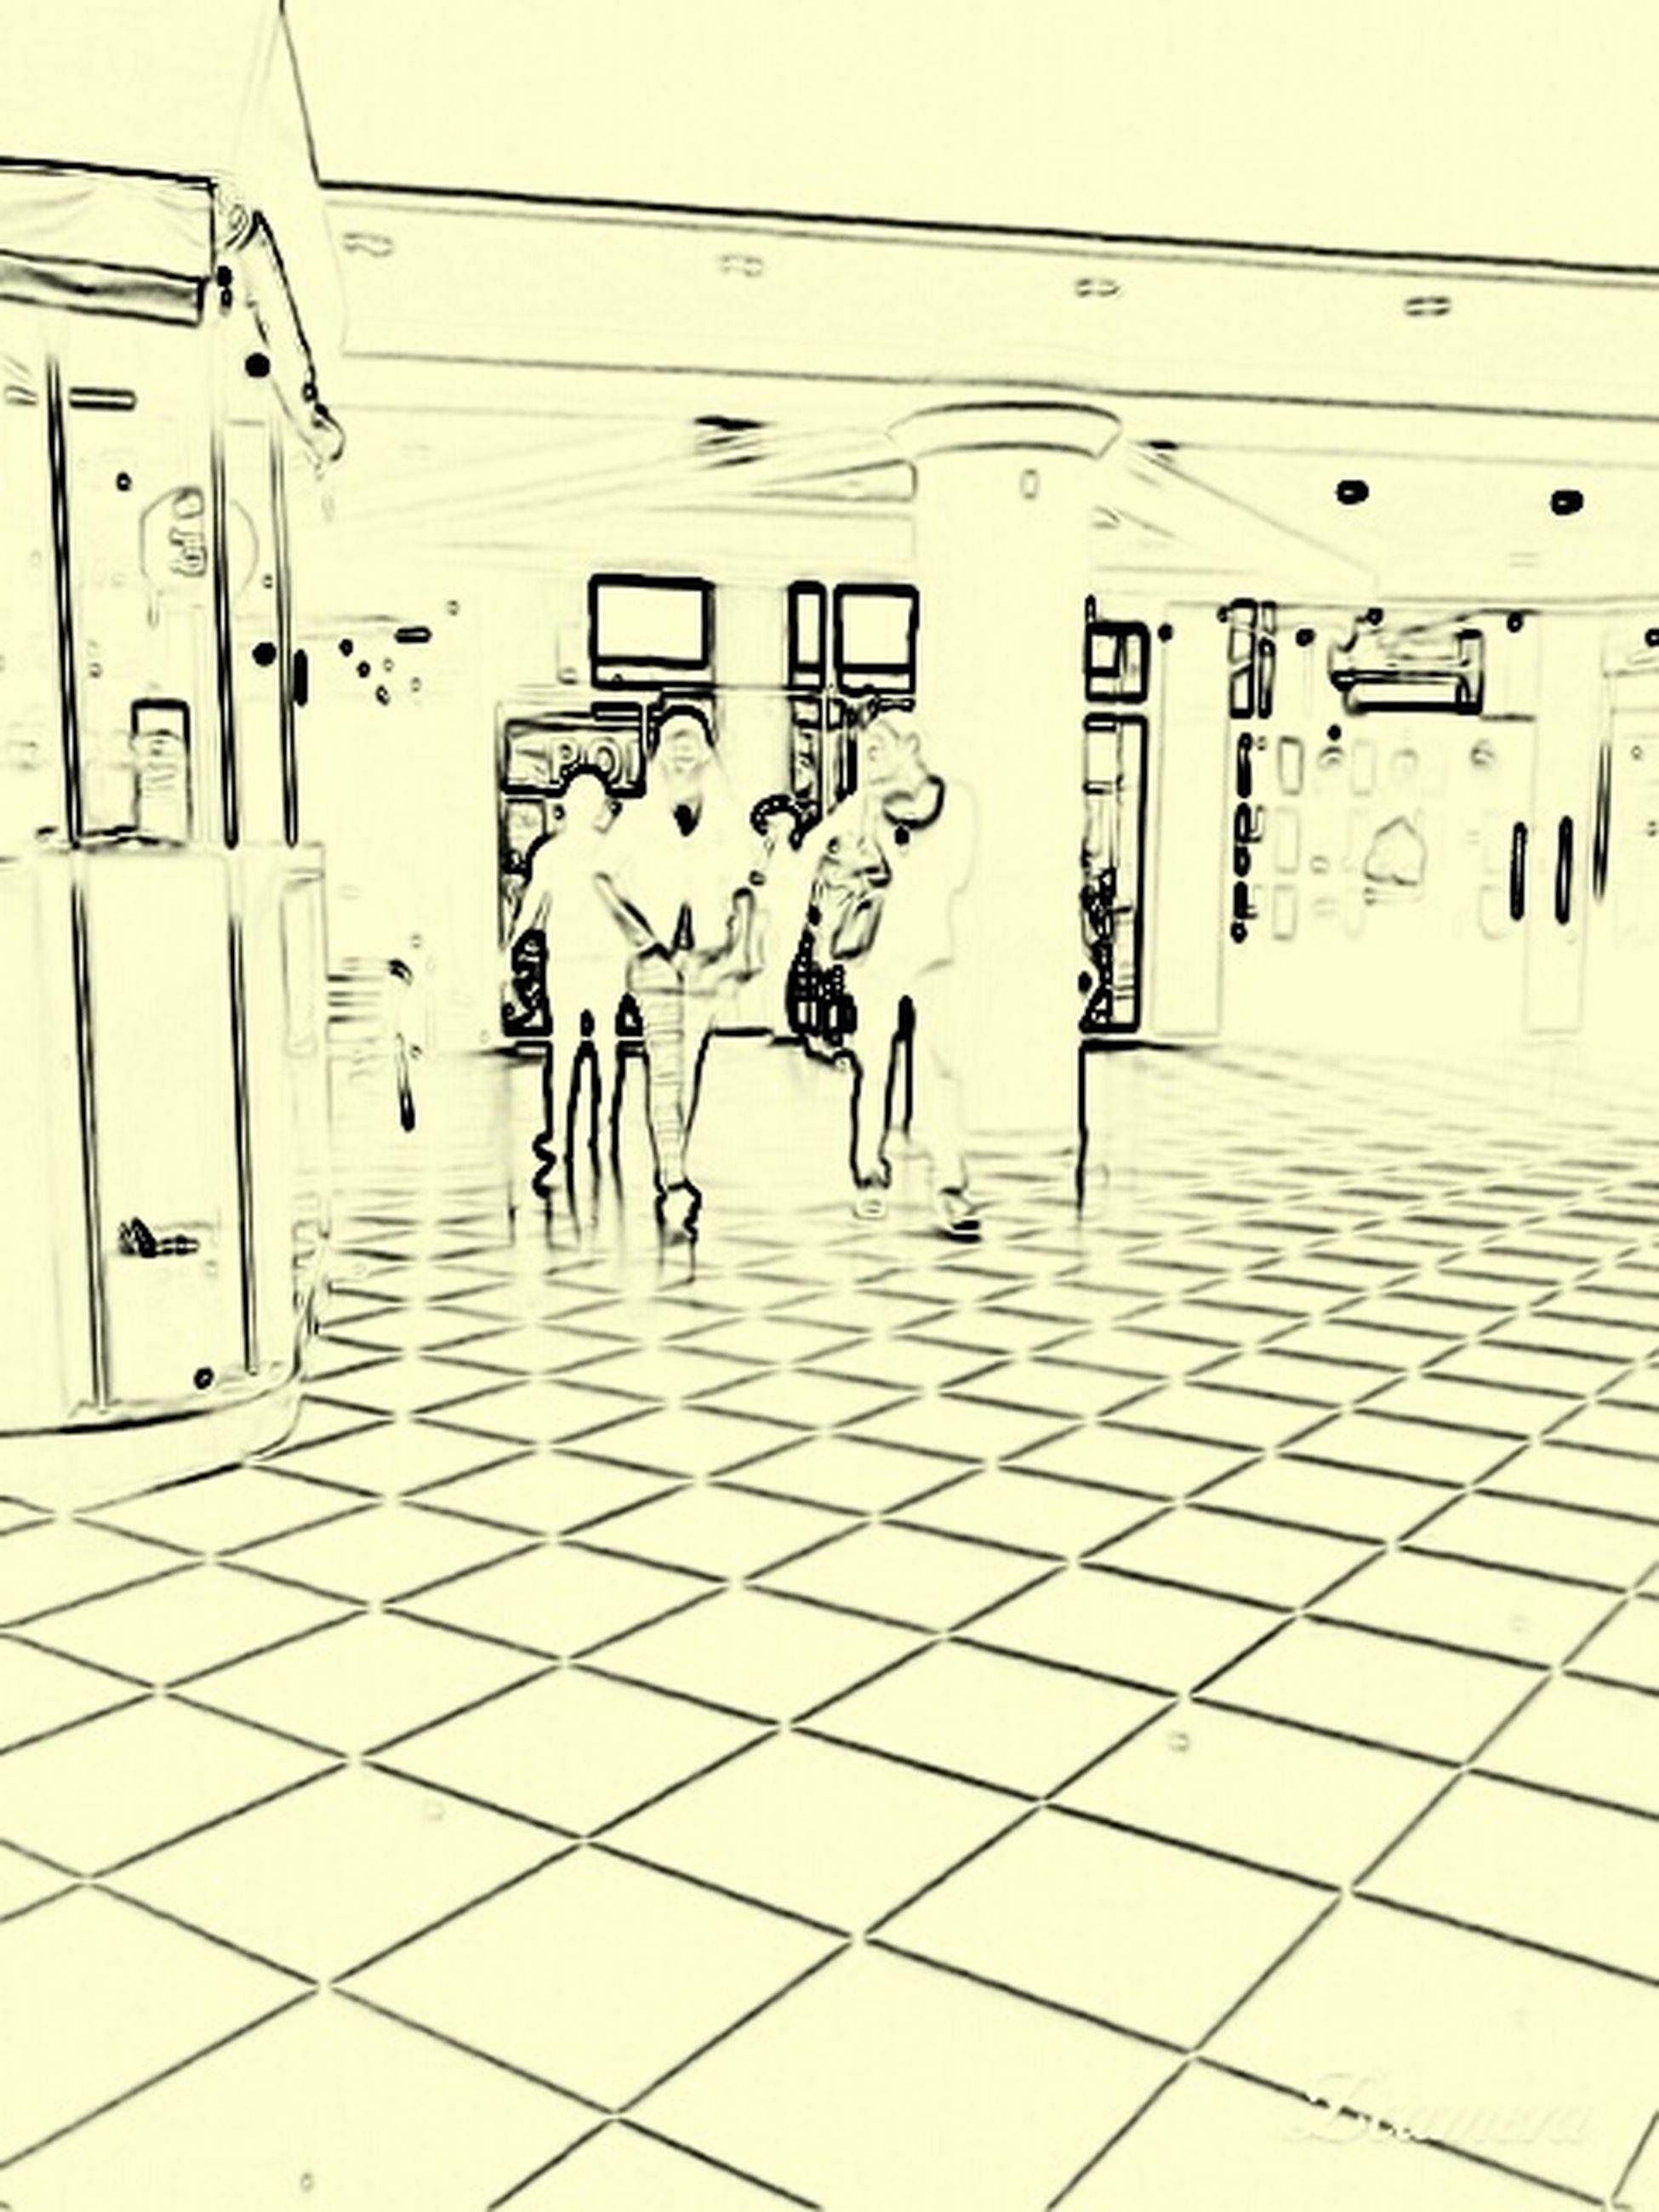 built structure, architecture, indoors, text, graffiti, railroad station, communication, western script, wall - building feature, transportation, tiled floor, men, ceiling, walking, day, flooring, railroad station platform, building exterior, incidental people